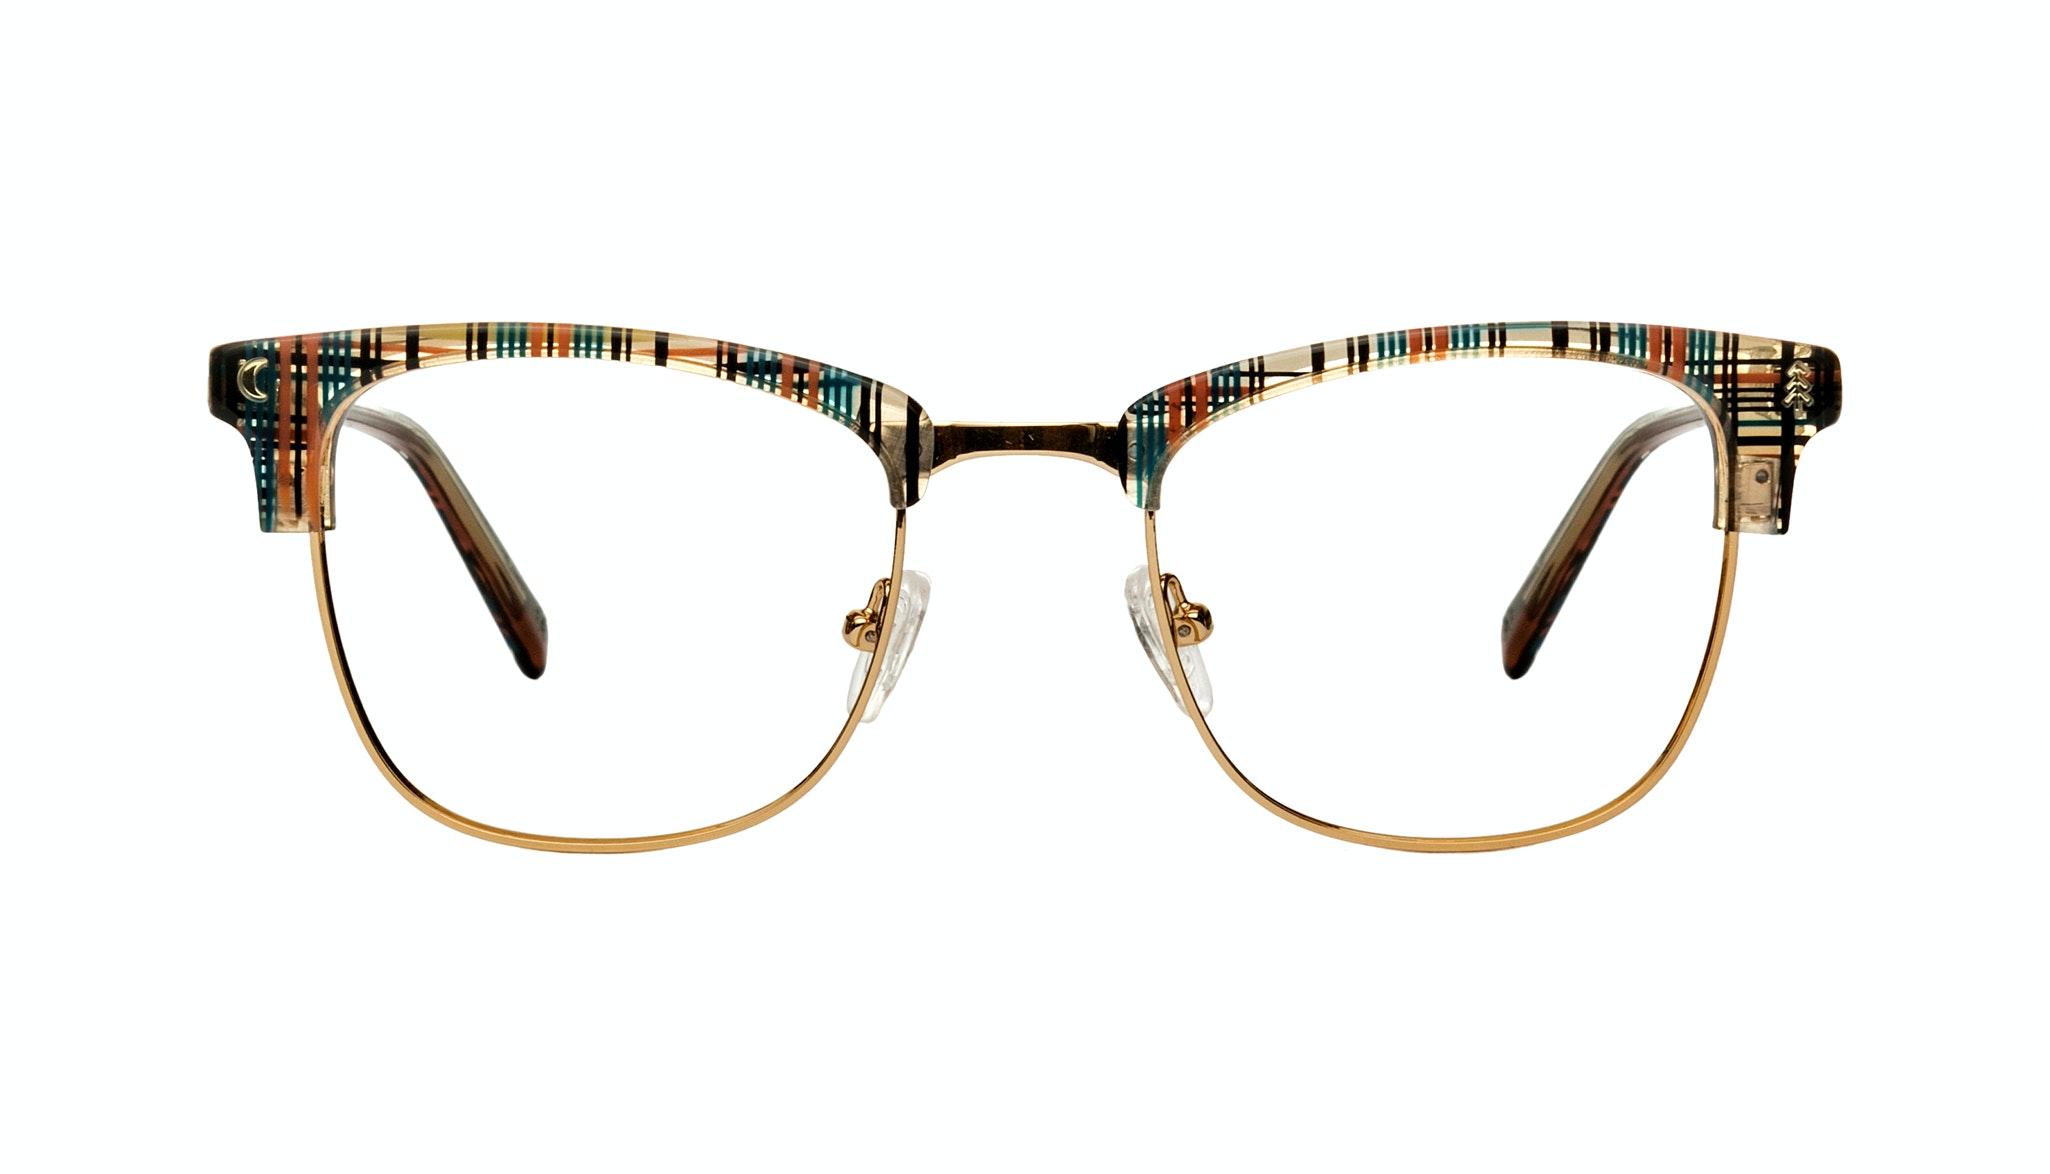 Affordable Fashion Glasses Rectangle Square Eyeglasses Women Stargazer Woodland Plaid Front